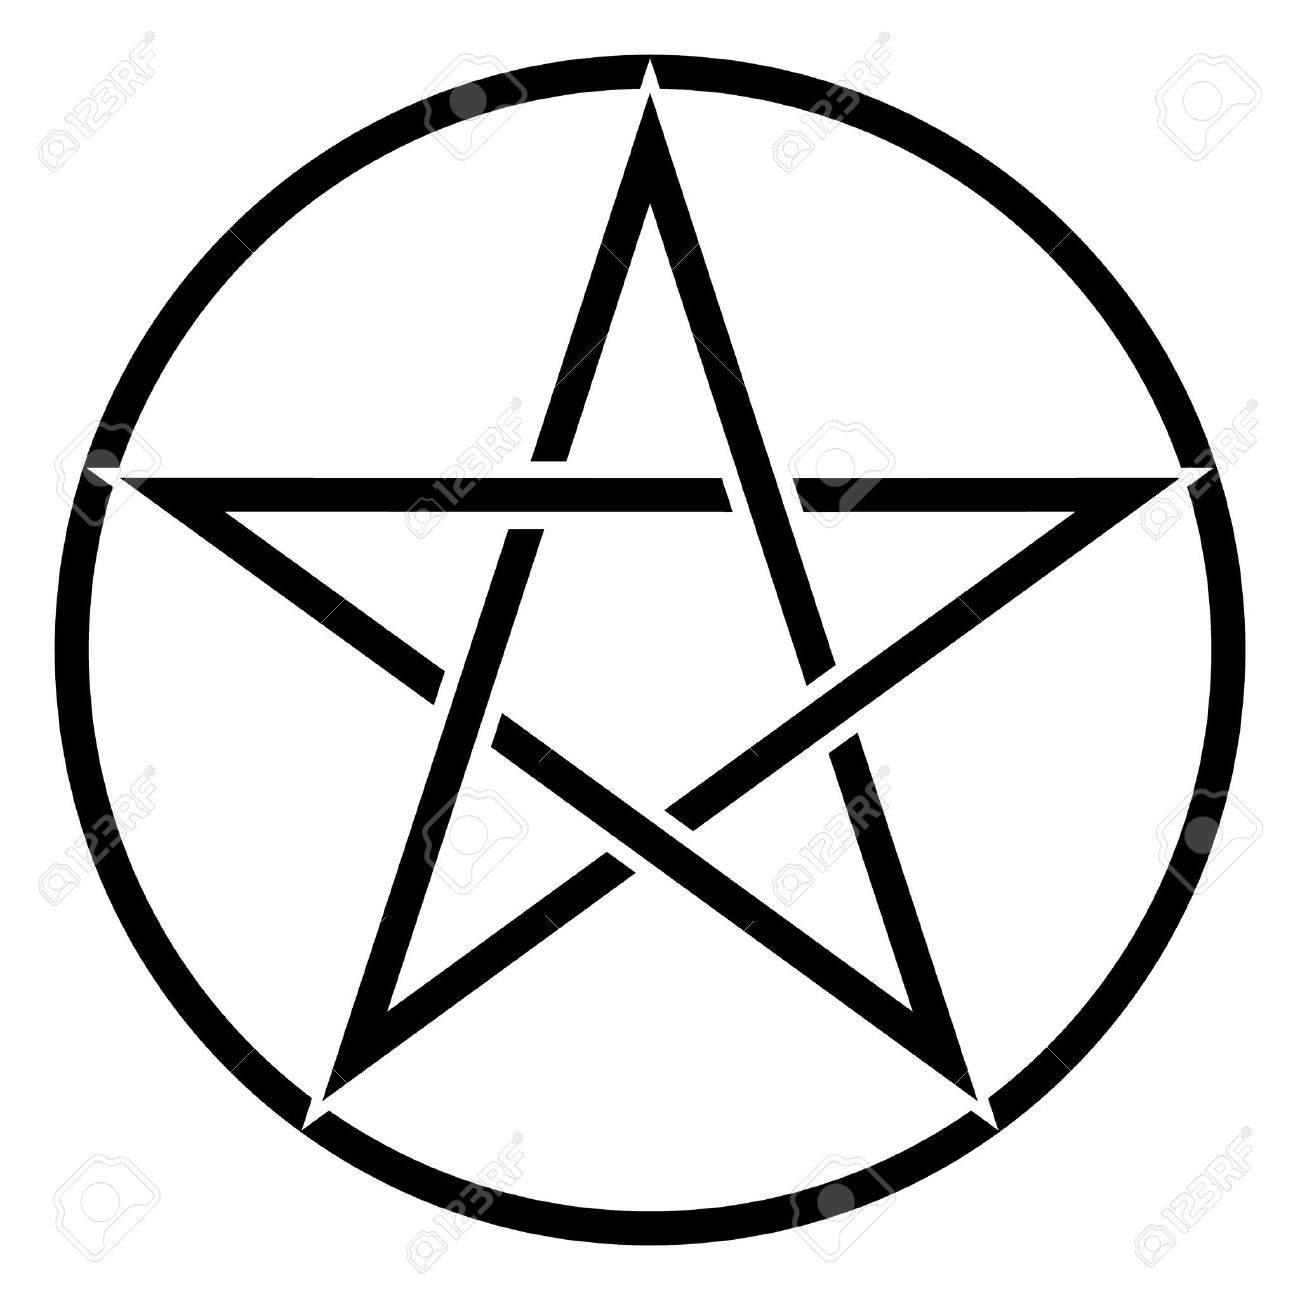 pentagram symbol royalty free cliparts vectors and stock rh 123rf com pentagram vector file vector pentagram